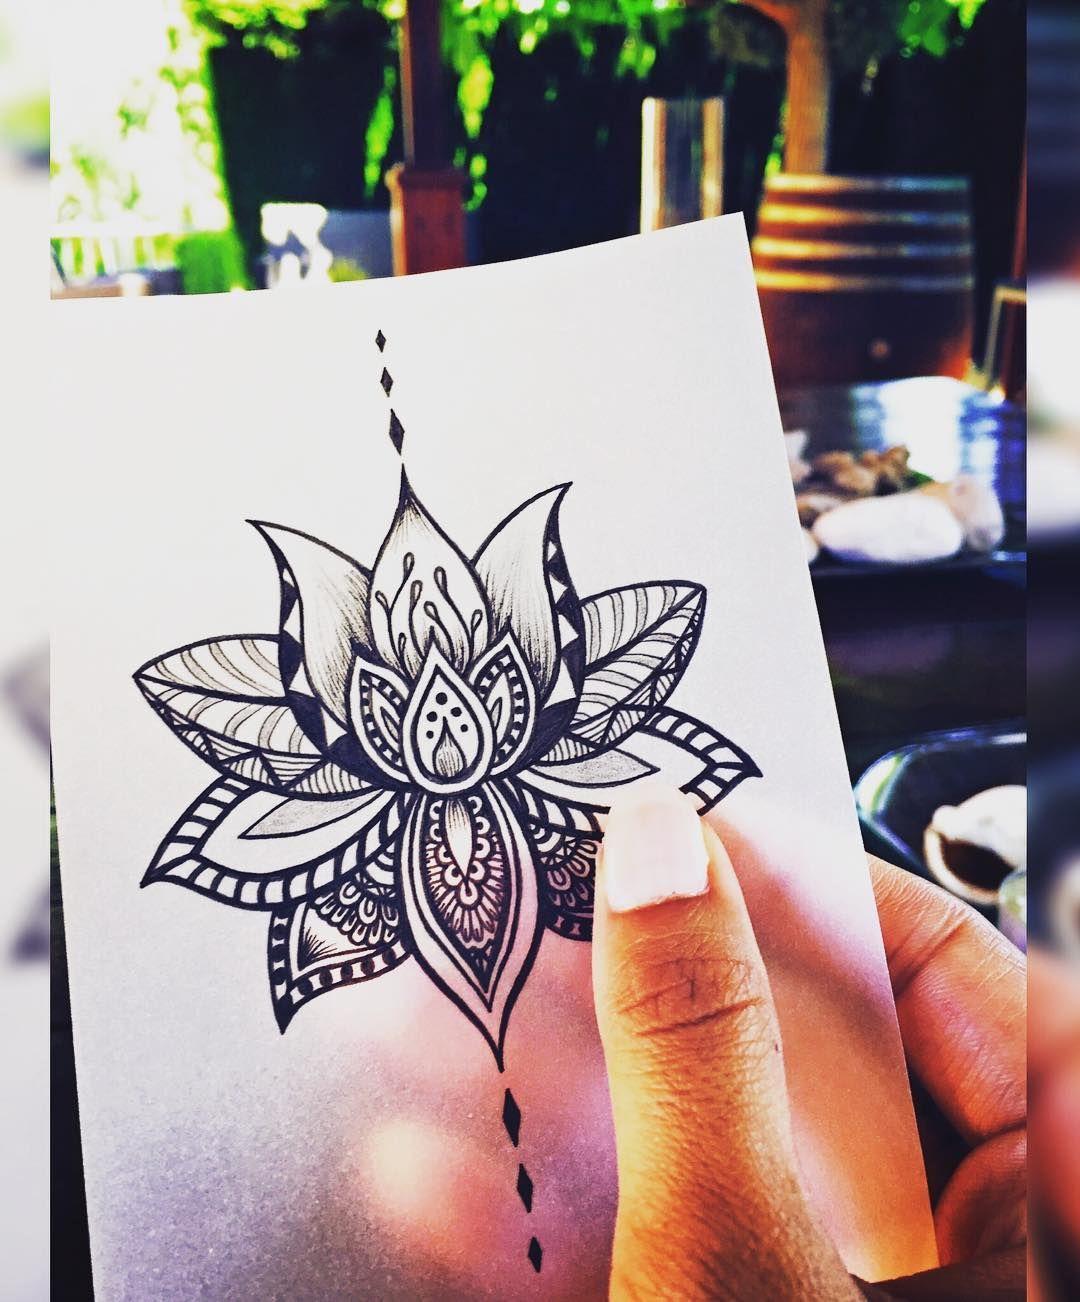 "𝑯𝒆𝒍𝒆𝒏𝒂 𝑳𝒍𝒐𝒓𝒆𝒕 𝑨𝒓𝒕 𝑻𝒂𝒕𝒕𝒐𝒐𝒊𝒏𝒈 on Instagram: ""🌸• Lotus Flower •🌸 #mandala #mandalas #zentangle #zen #zenart #art #arte #artist #lotusflower #flower #flordeloto #lotusflowertattoo…"""